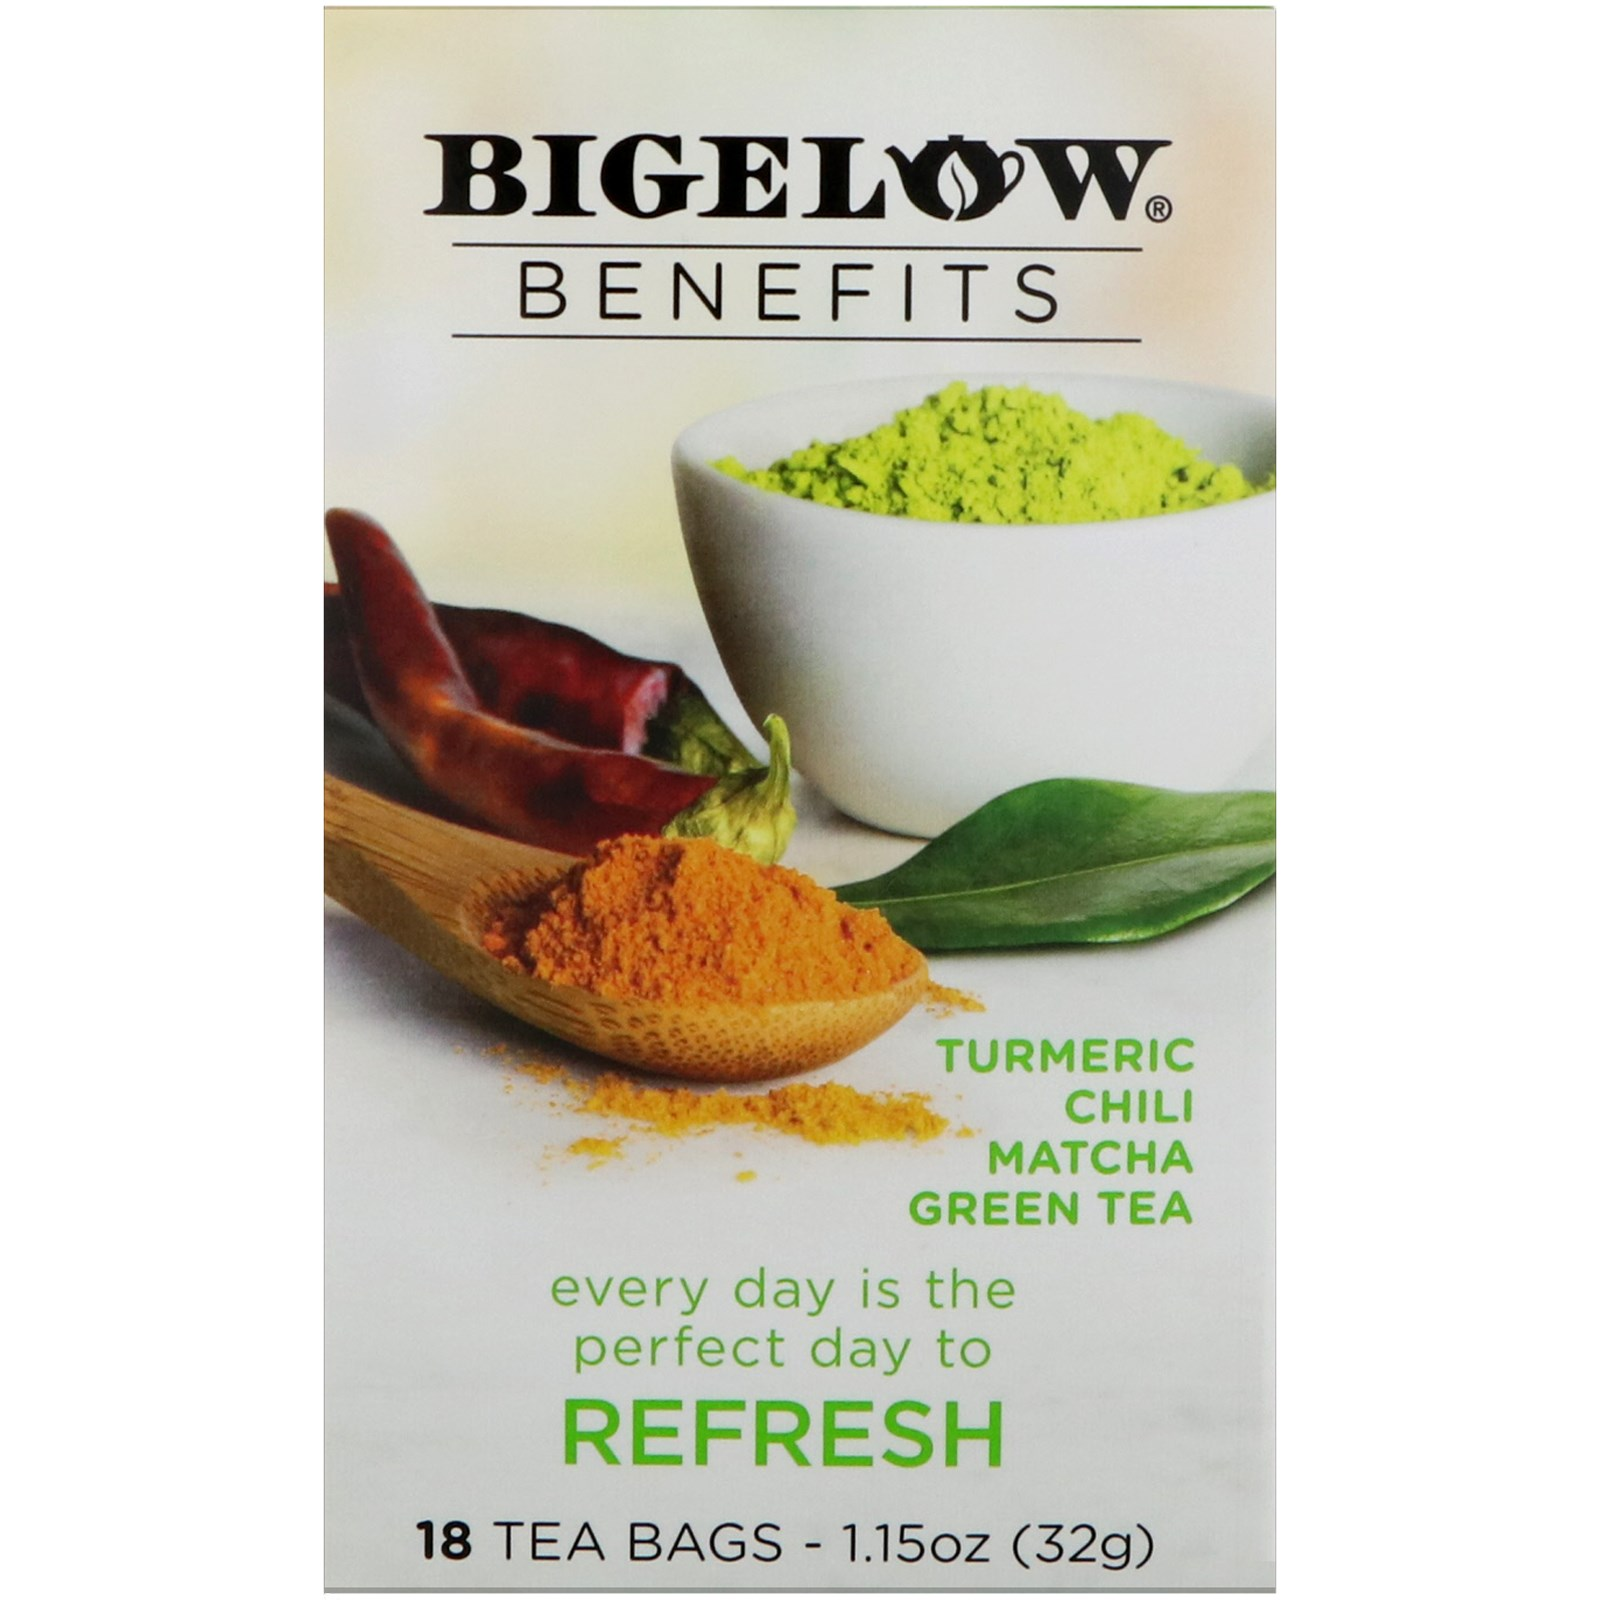 Bigelow, Benefits, Refresh, Turmeric Chili Matcha Green